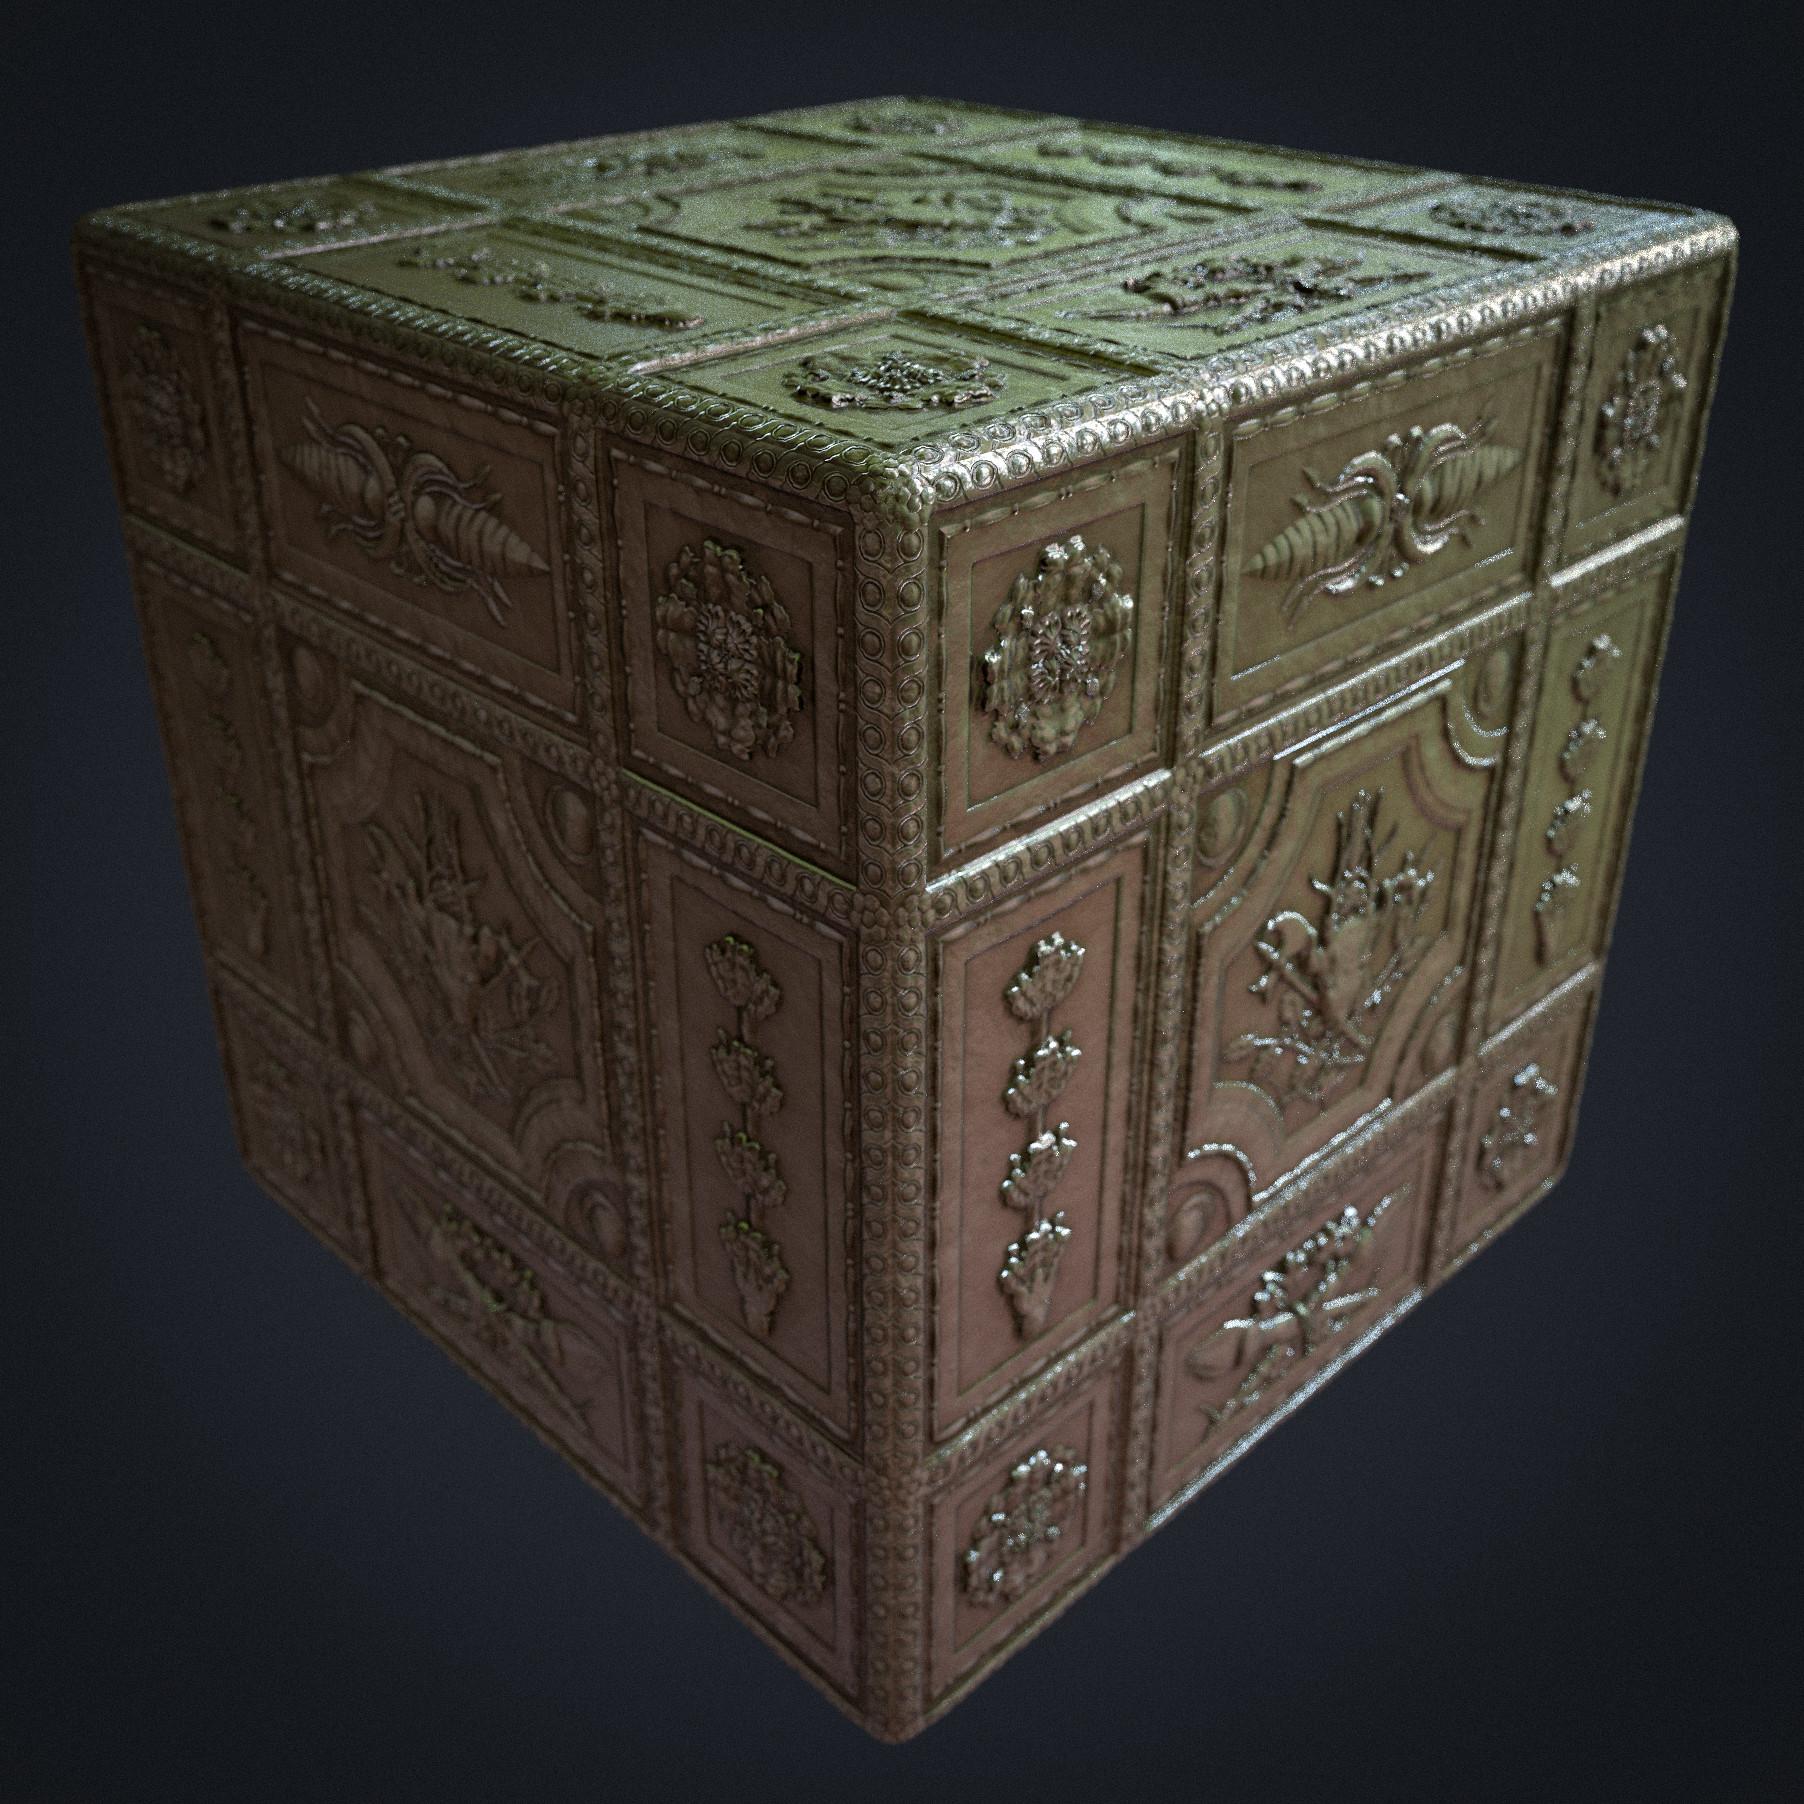 Chris injae choi deerhex cube 9 12 1 2018